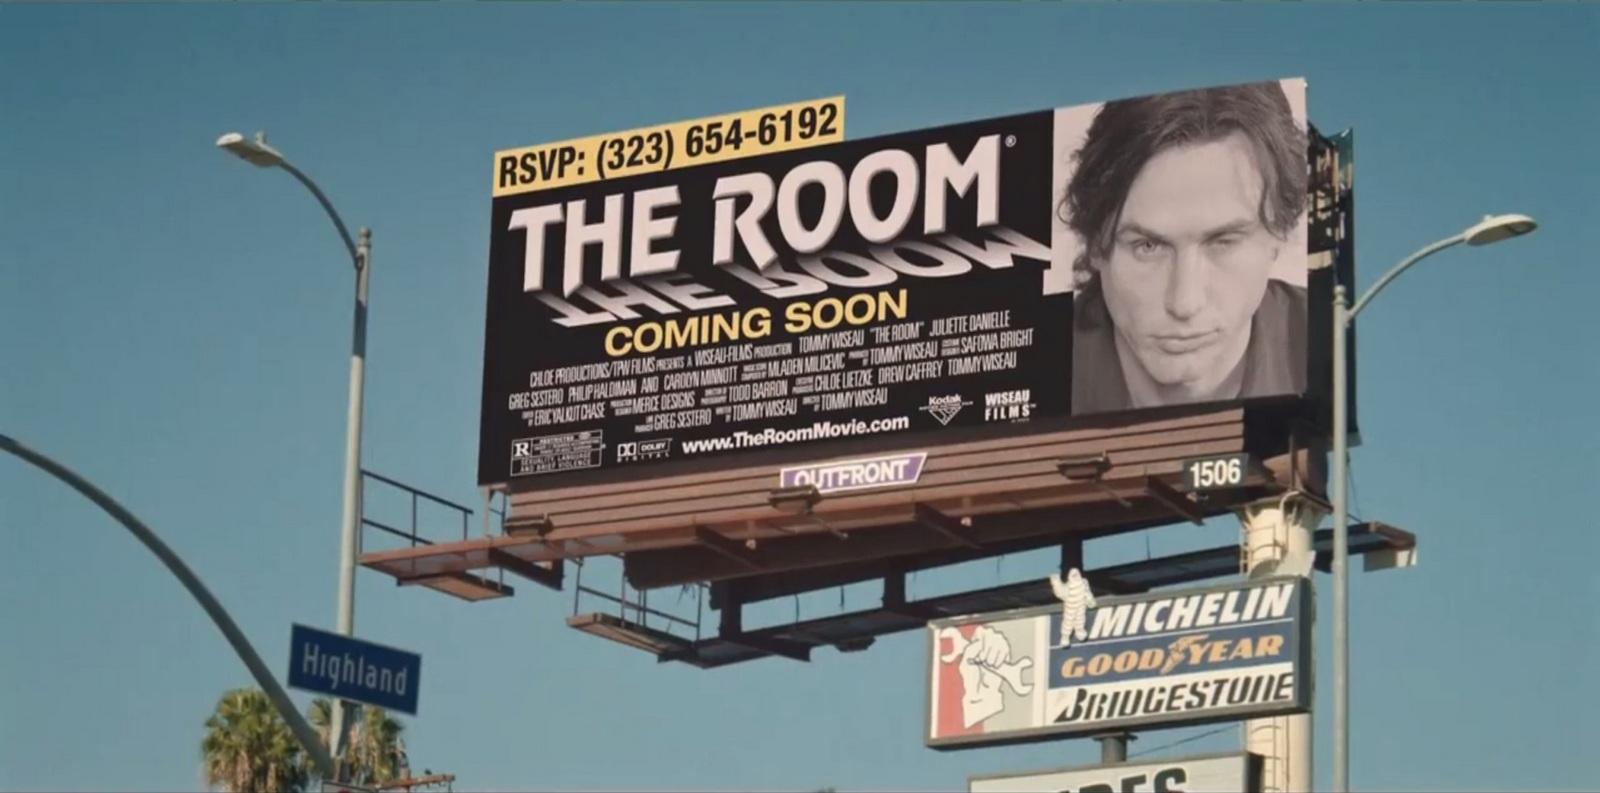 The Room (1)-001.jpg